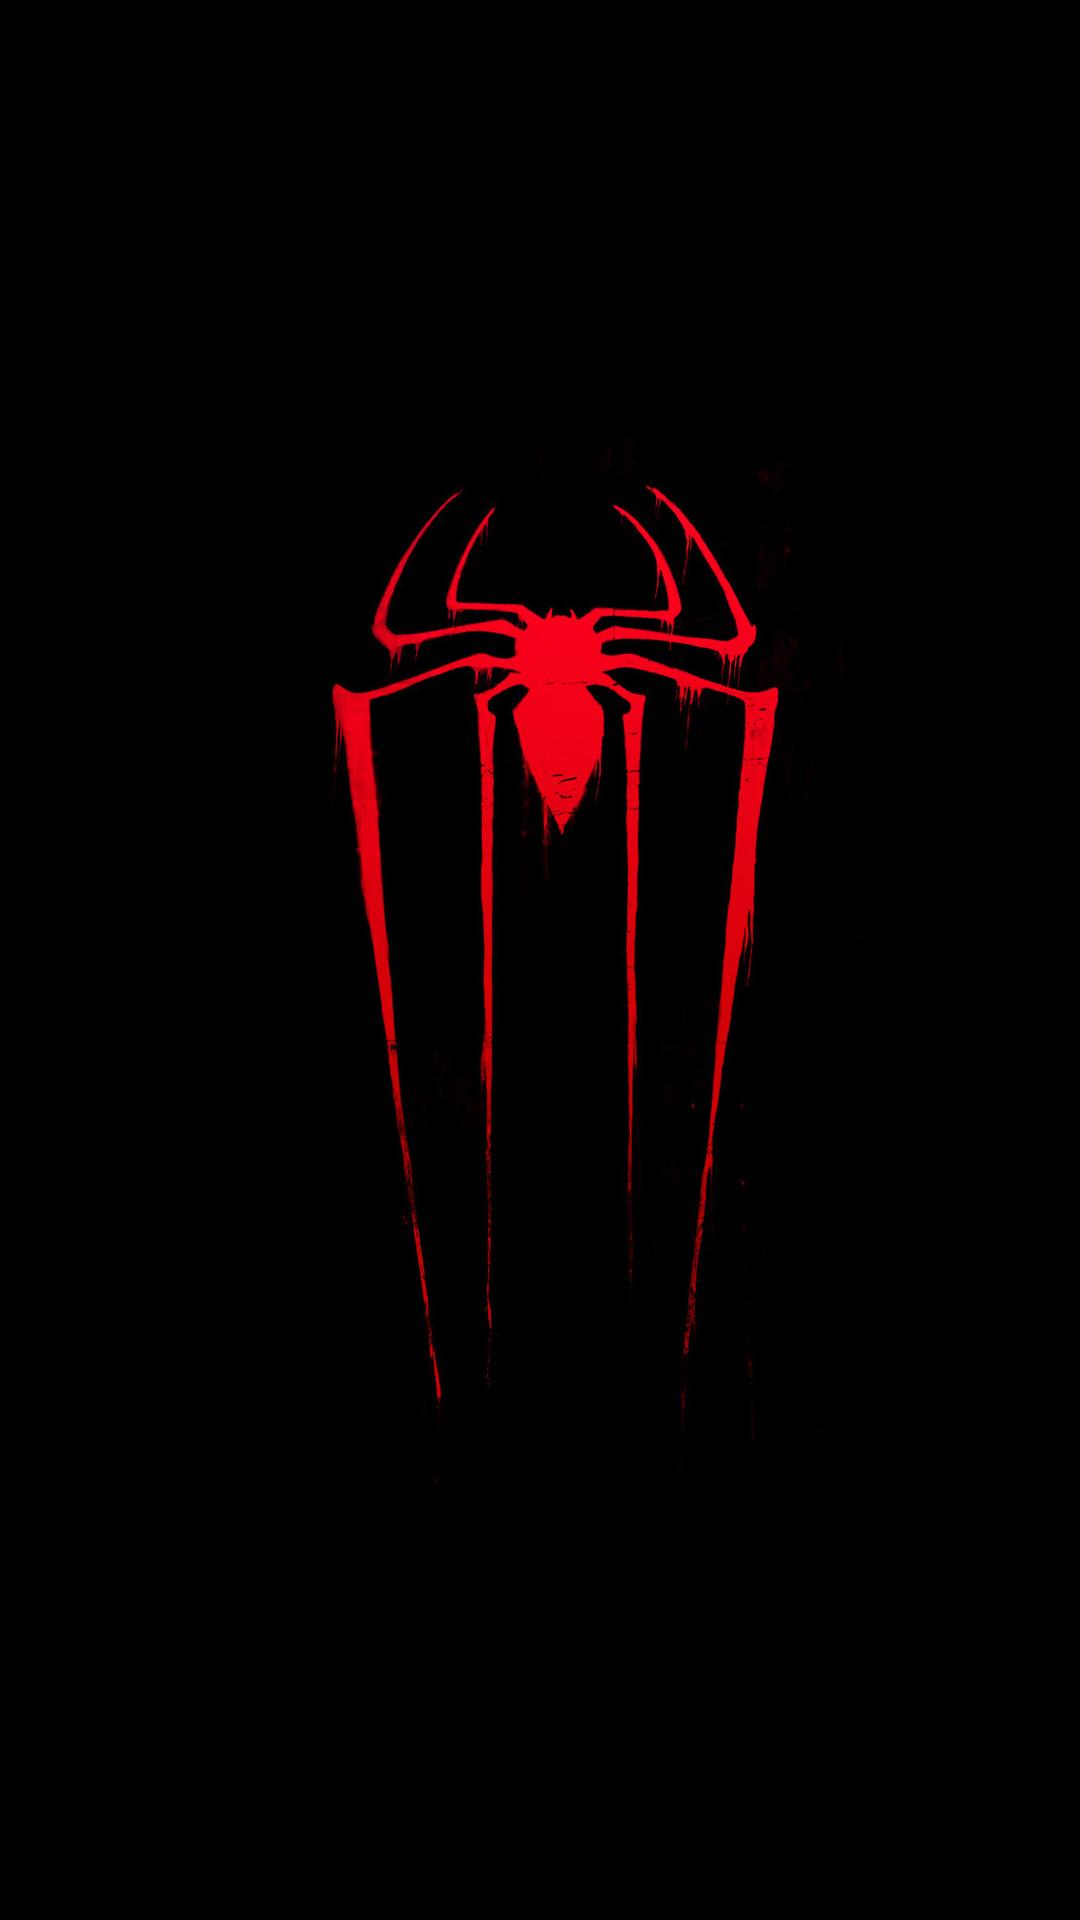 Download Wallpaper Spiderman Hd Spider Man Logo Wallpapers 183 ① Wallpapertag